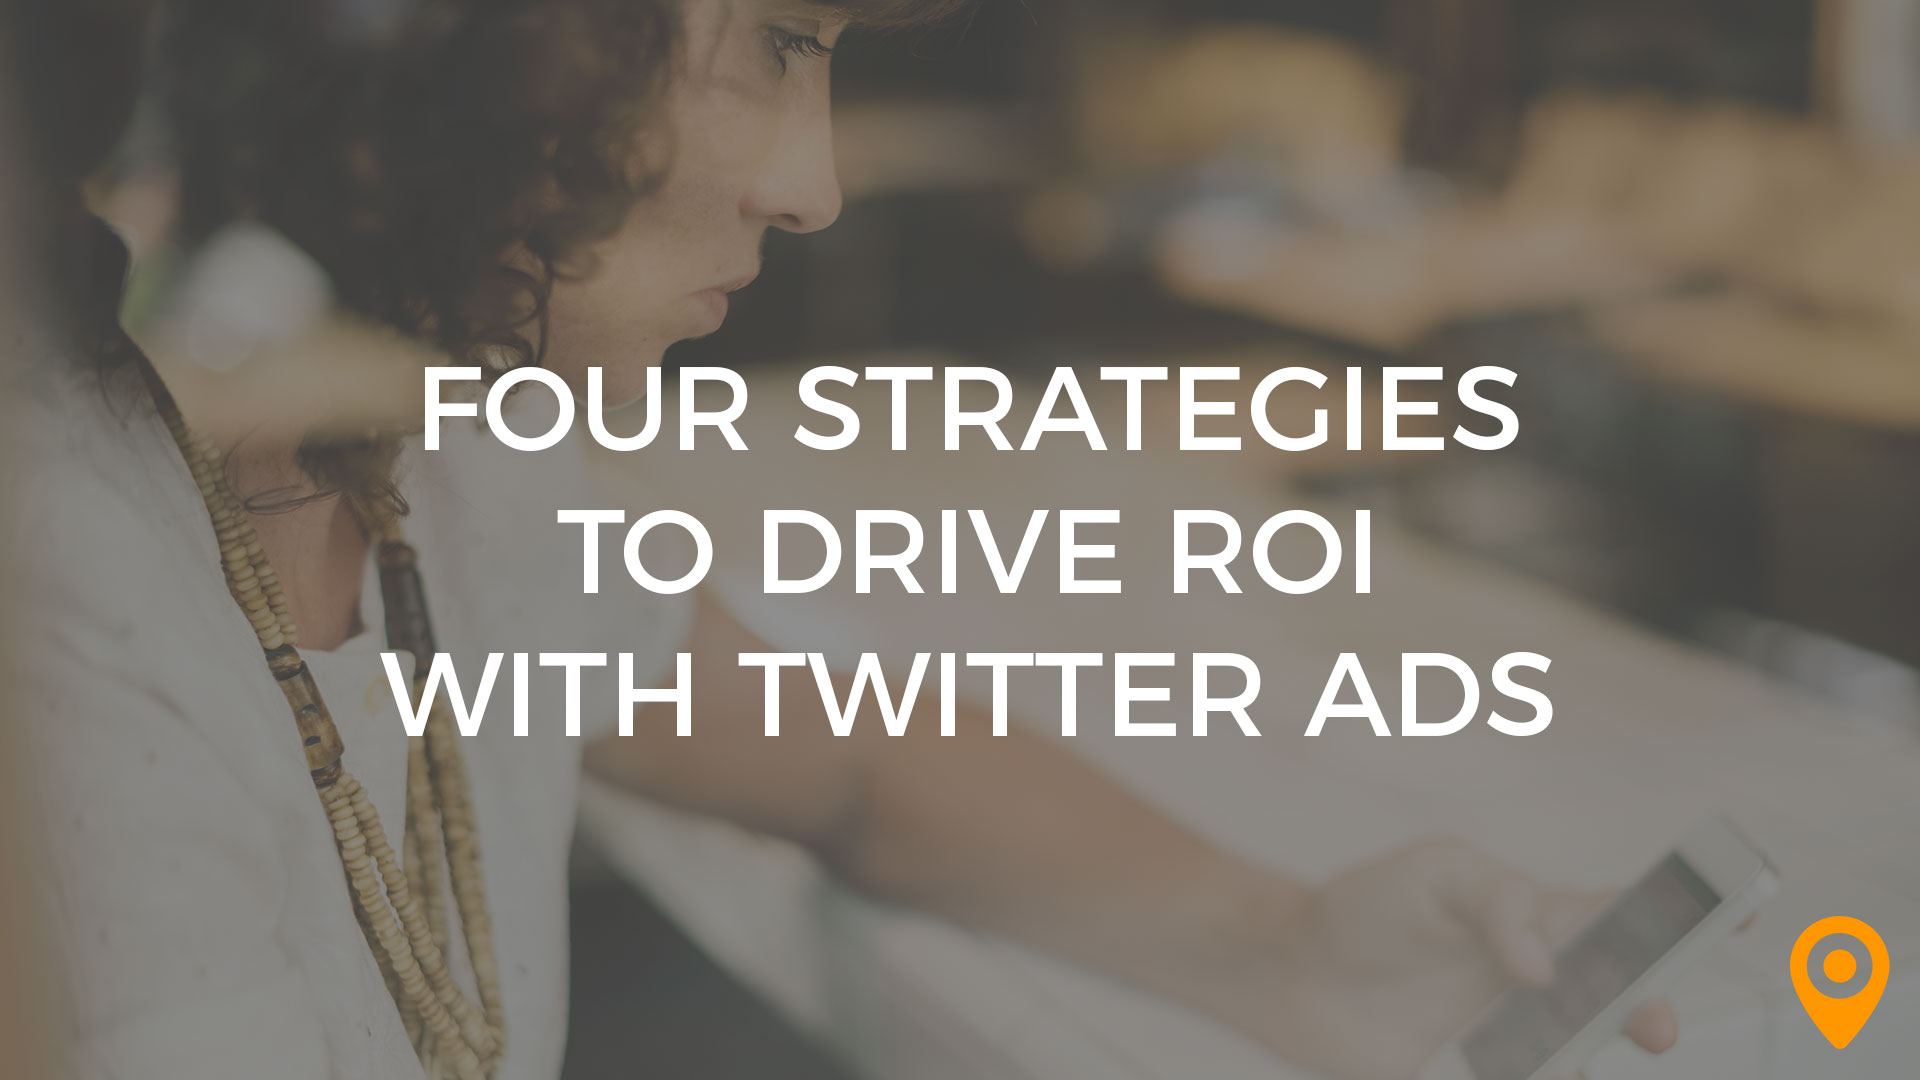 ROI twitter ads